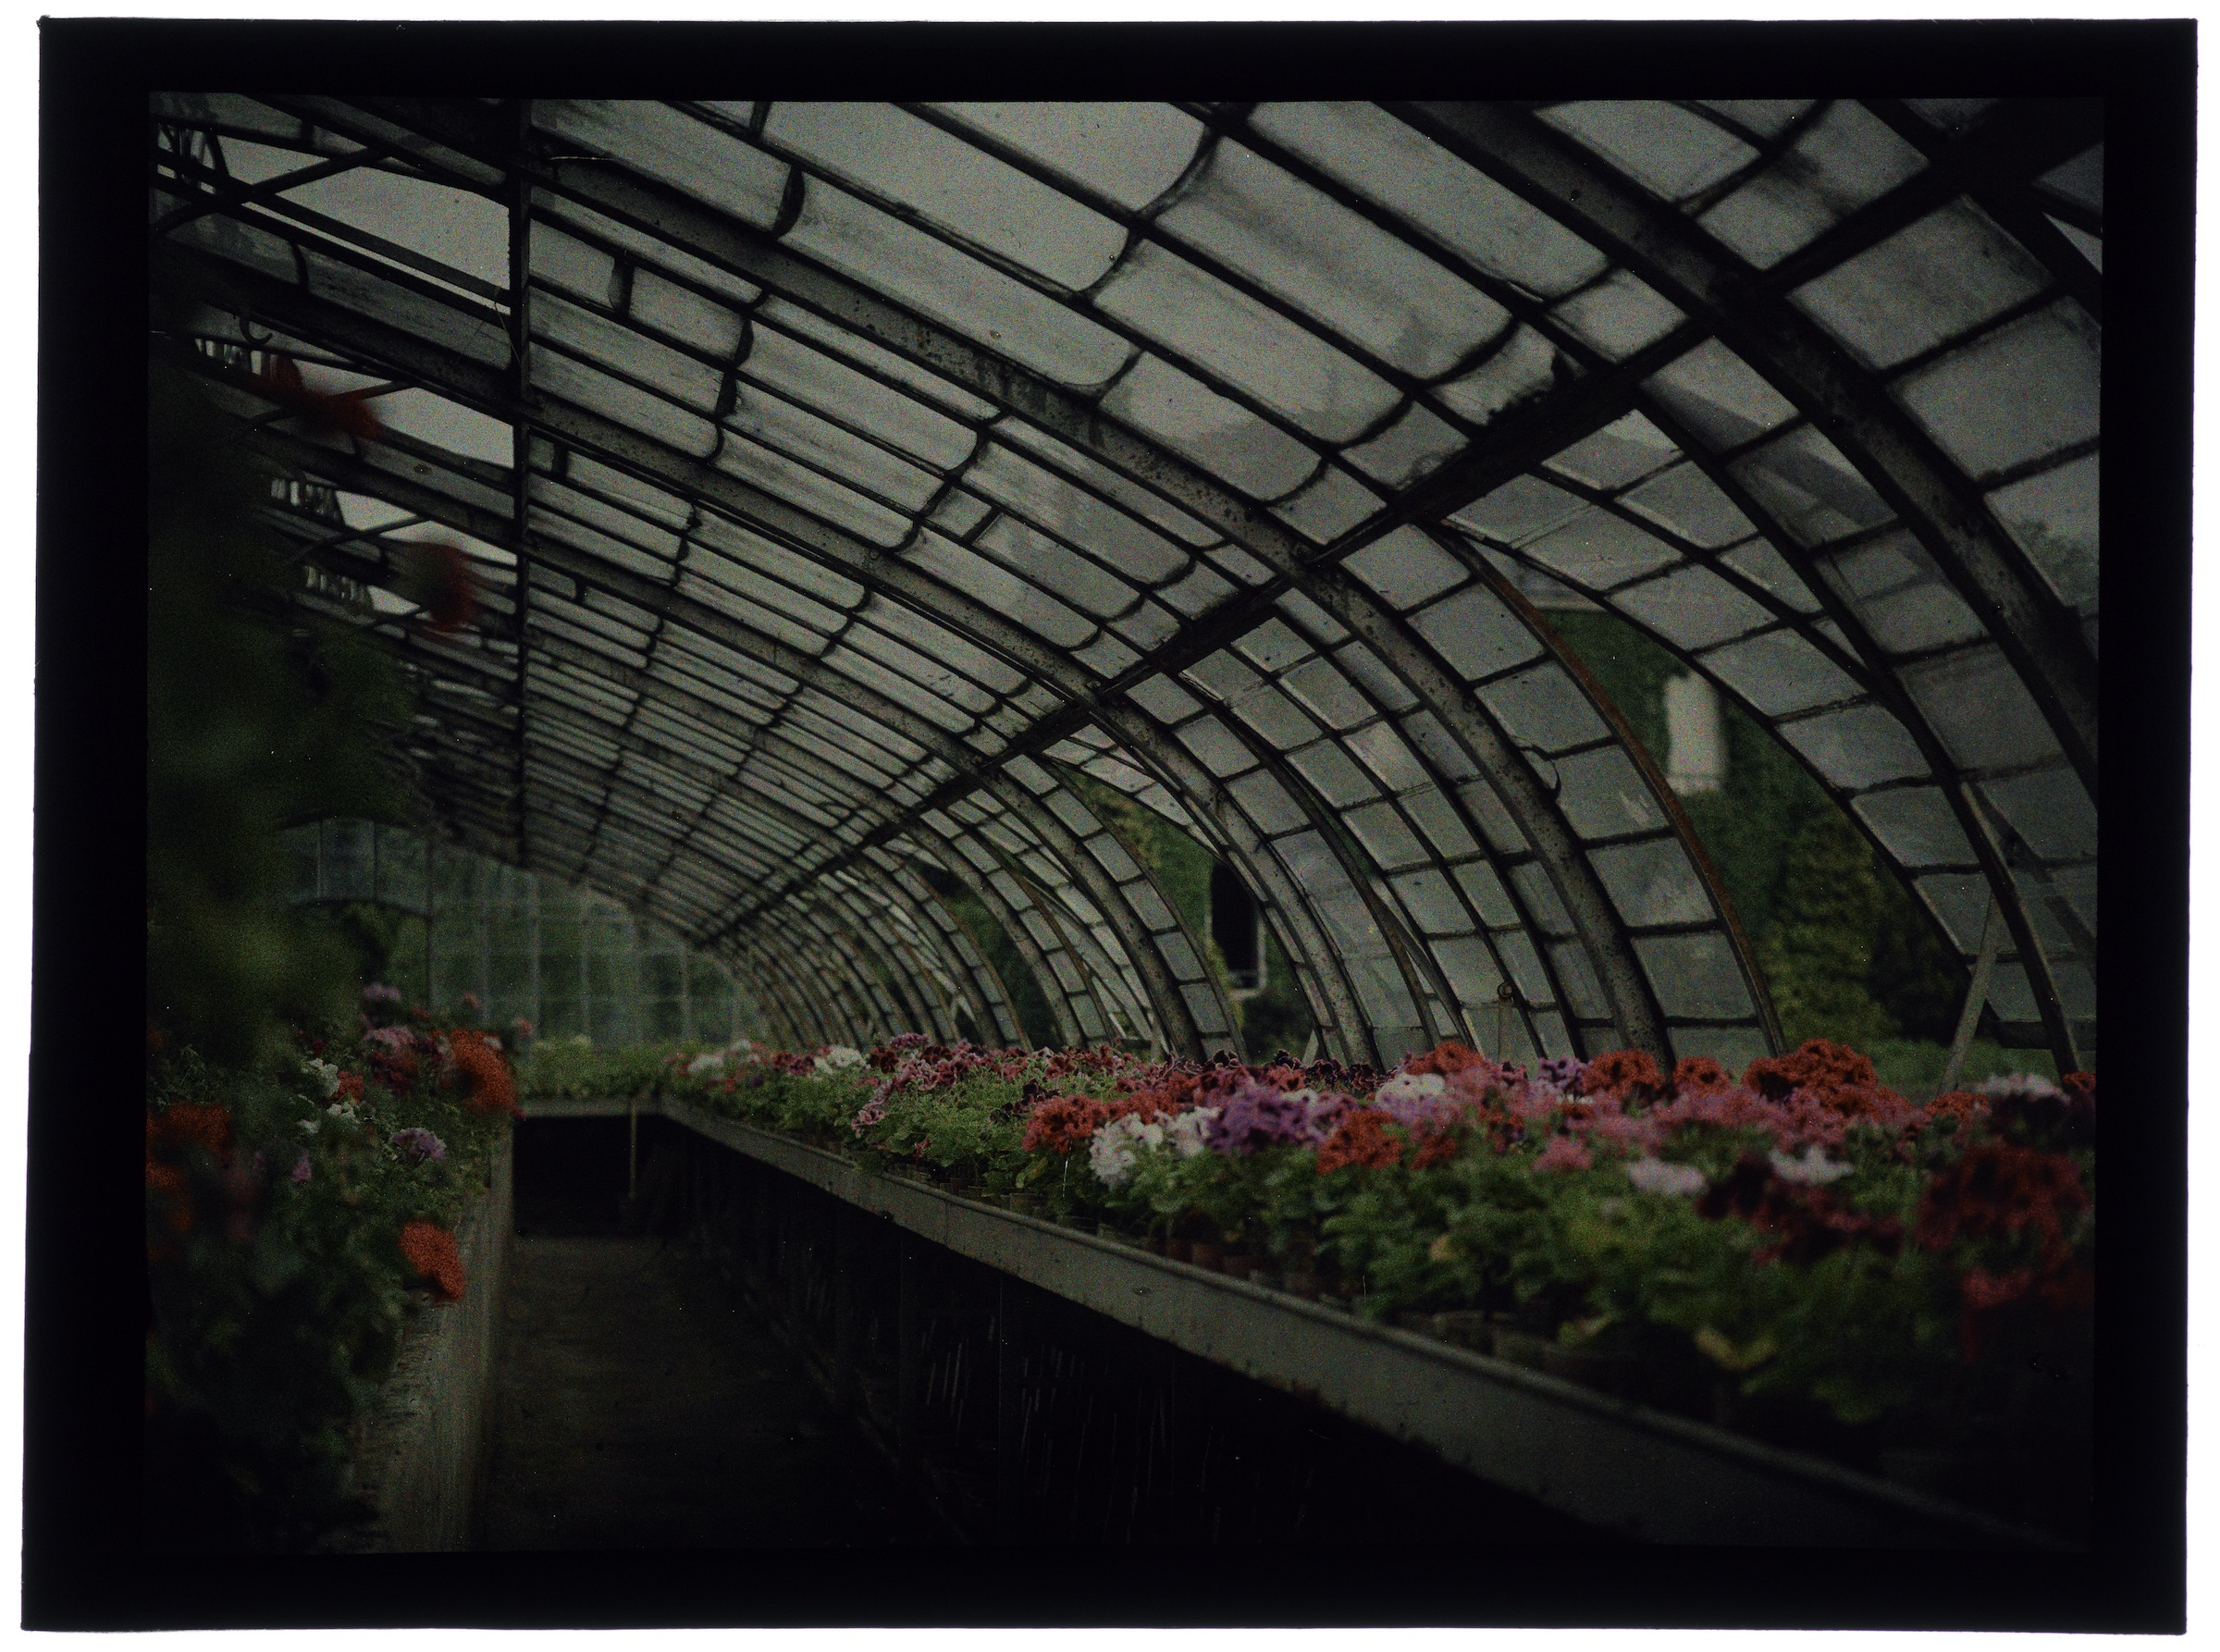 Fleurs dans la serre arrondie et iris au jardin